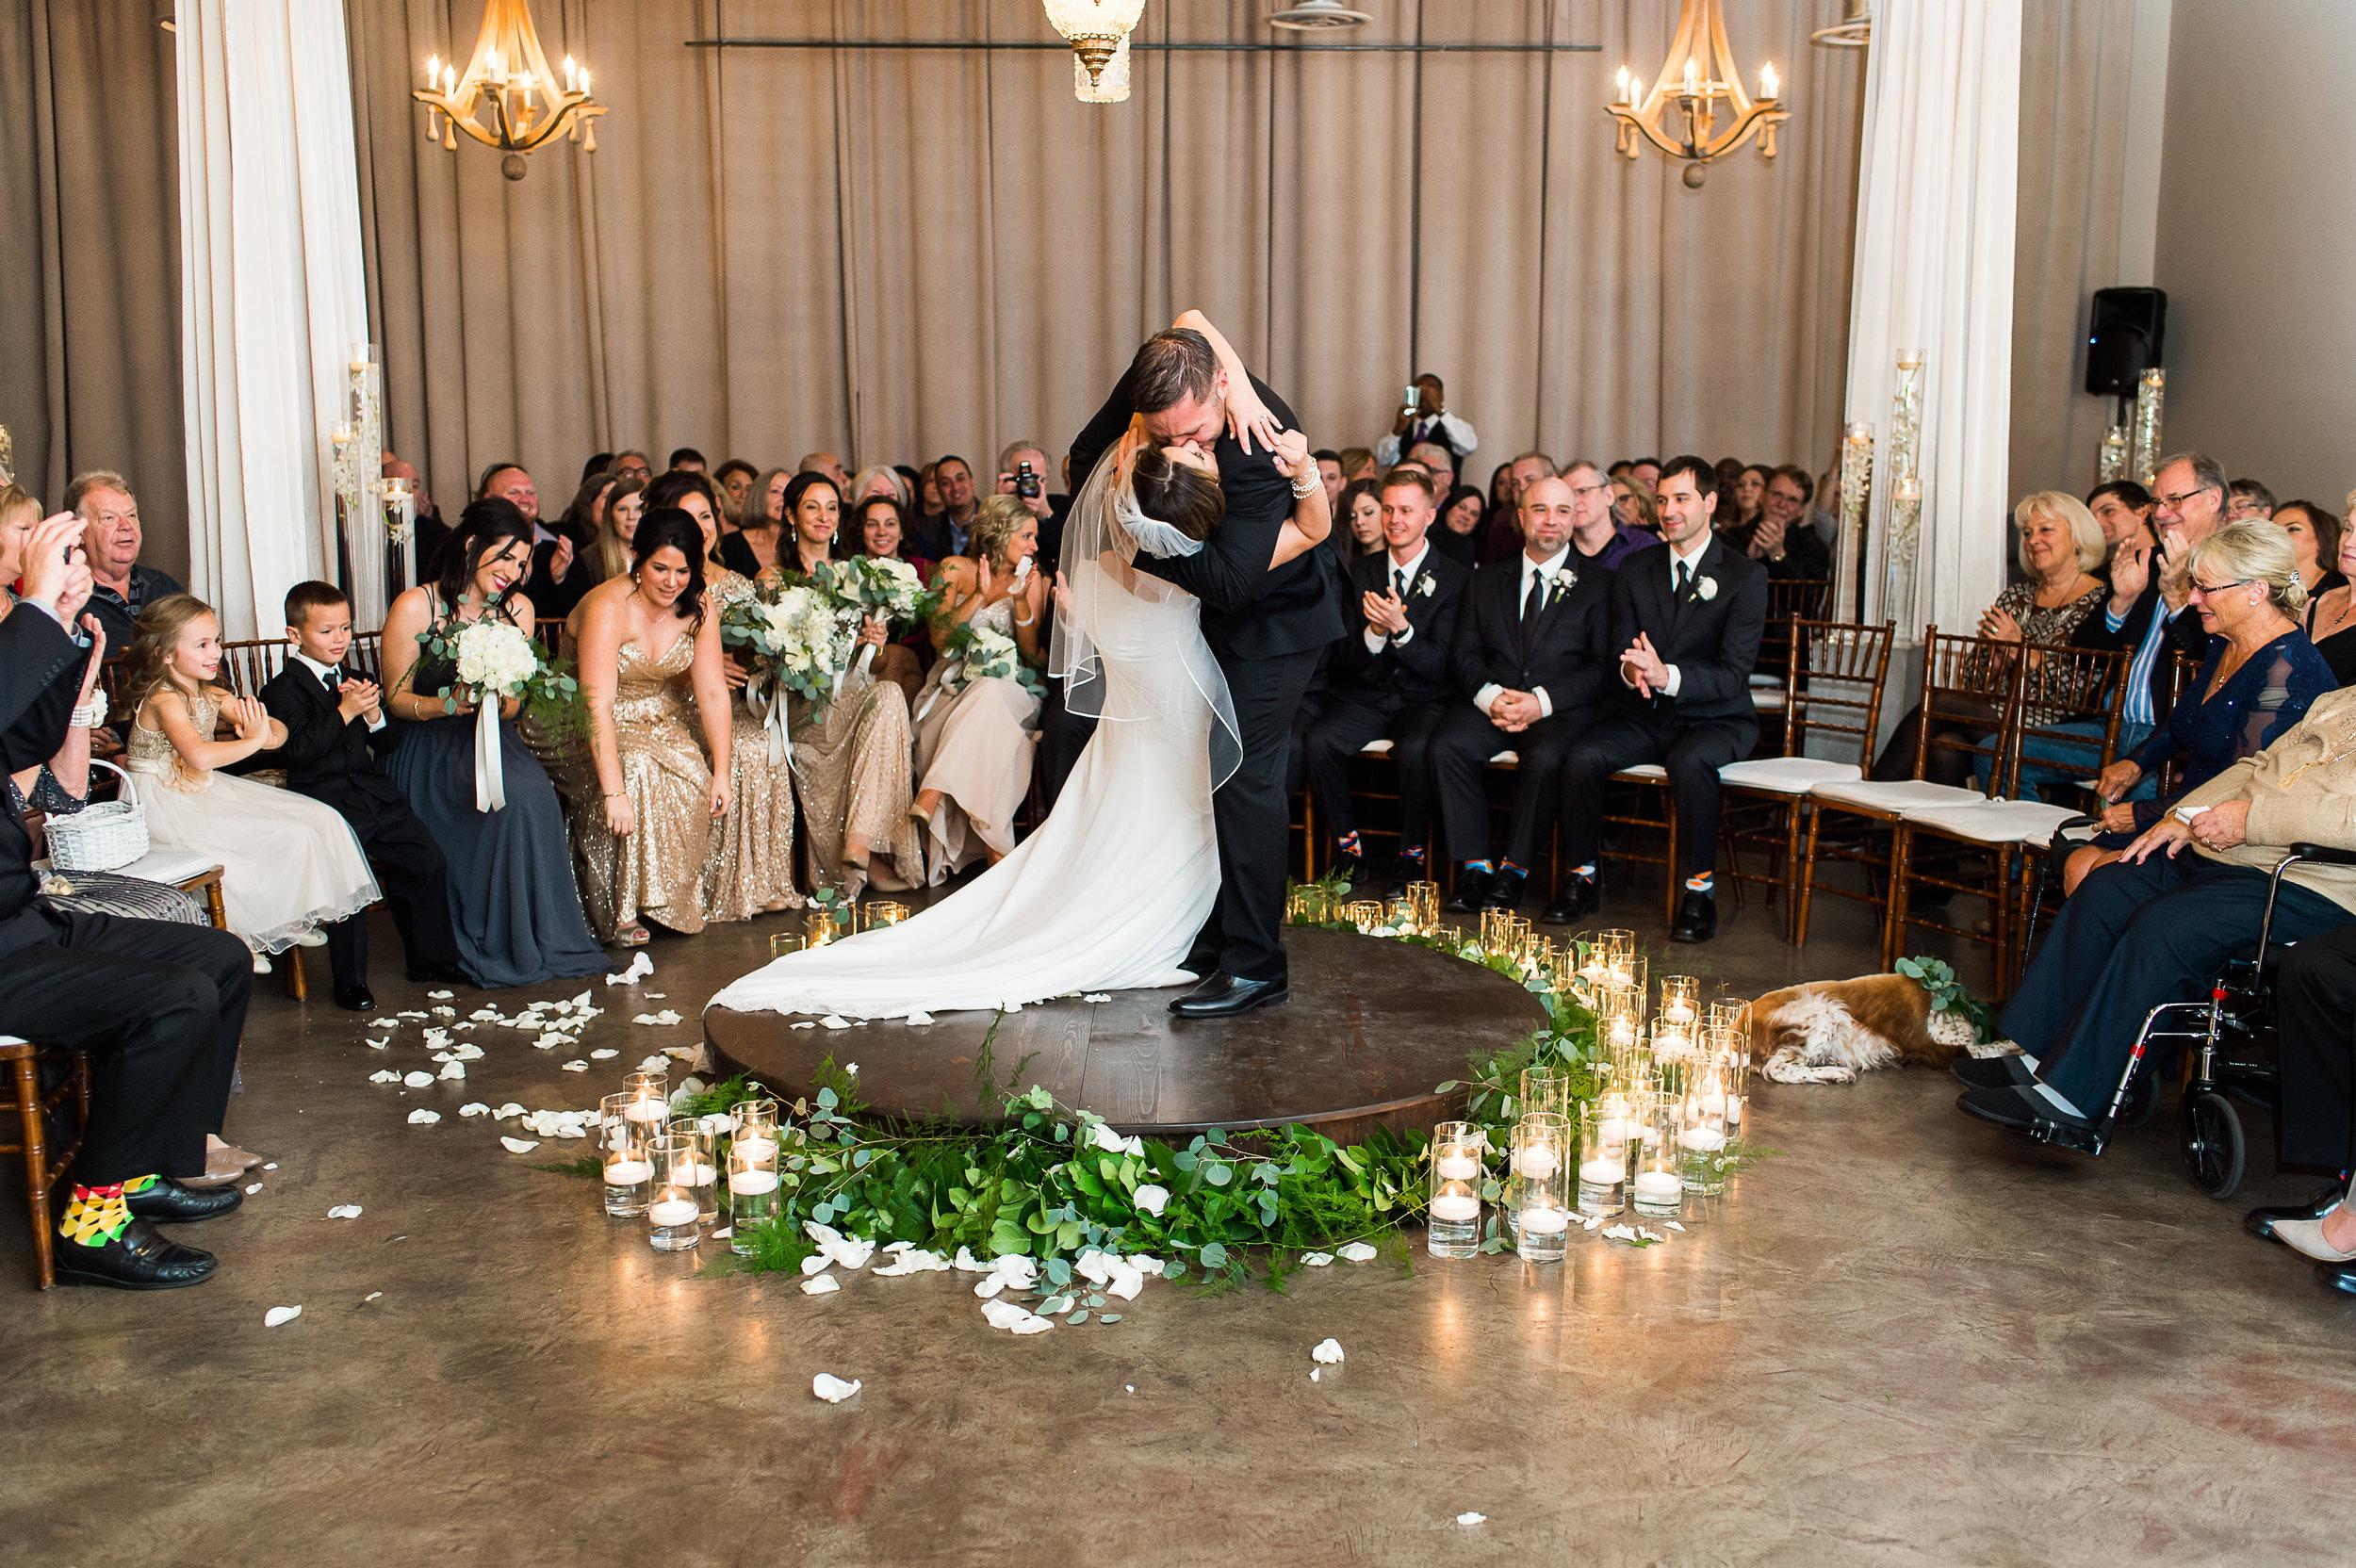 JJ-wedding-Van-Wyhe-Photography-401.jpg